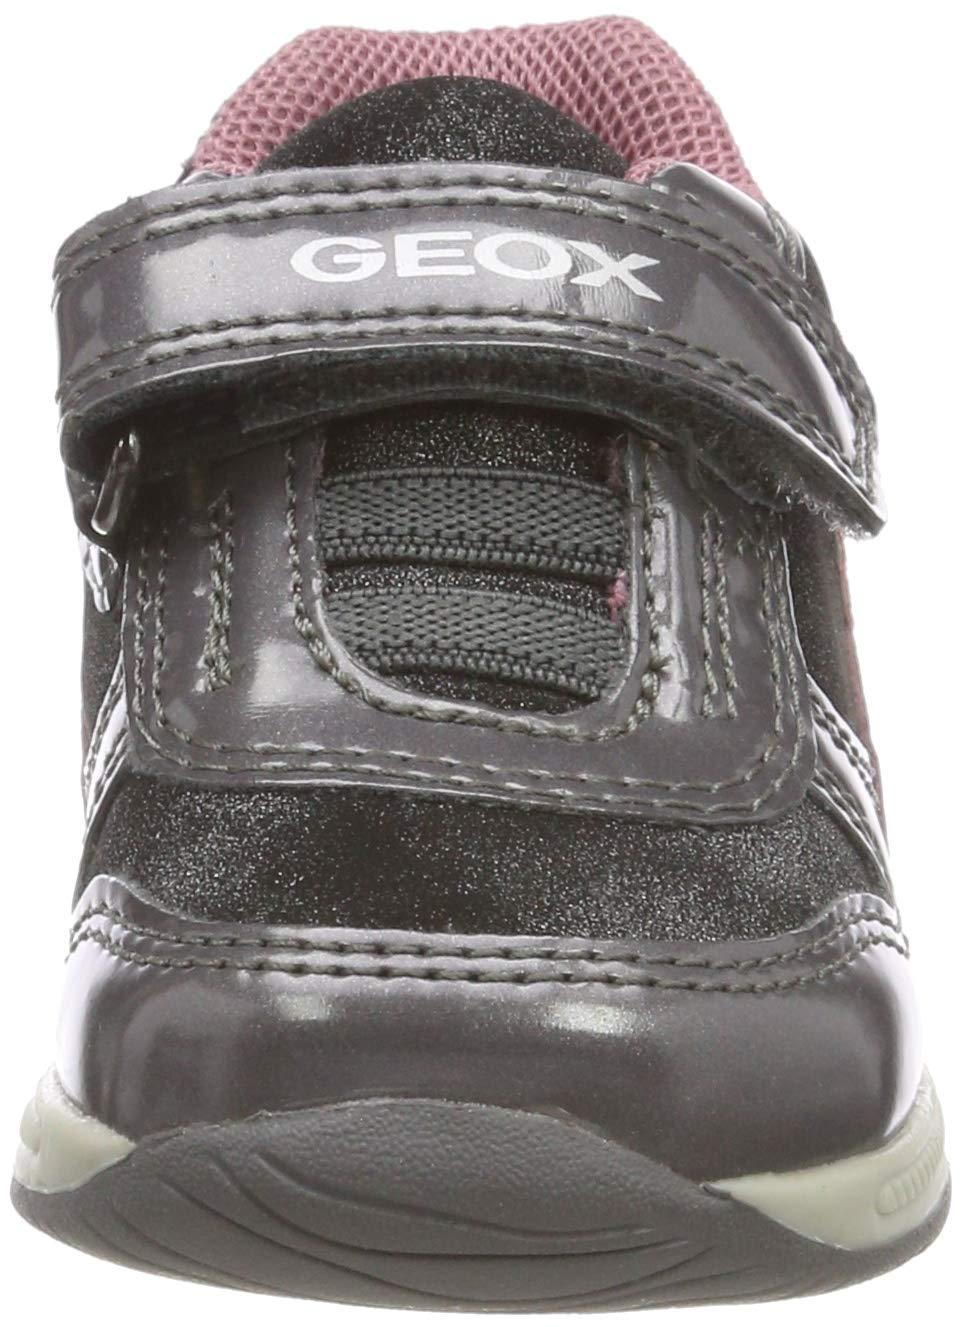 Geox B Rishon Girl B, Zapatillas Niñas